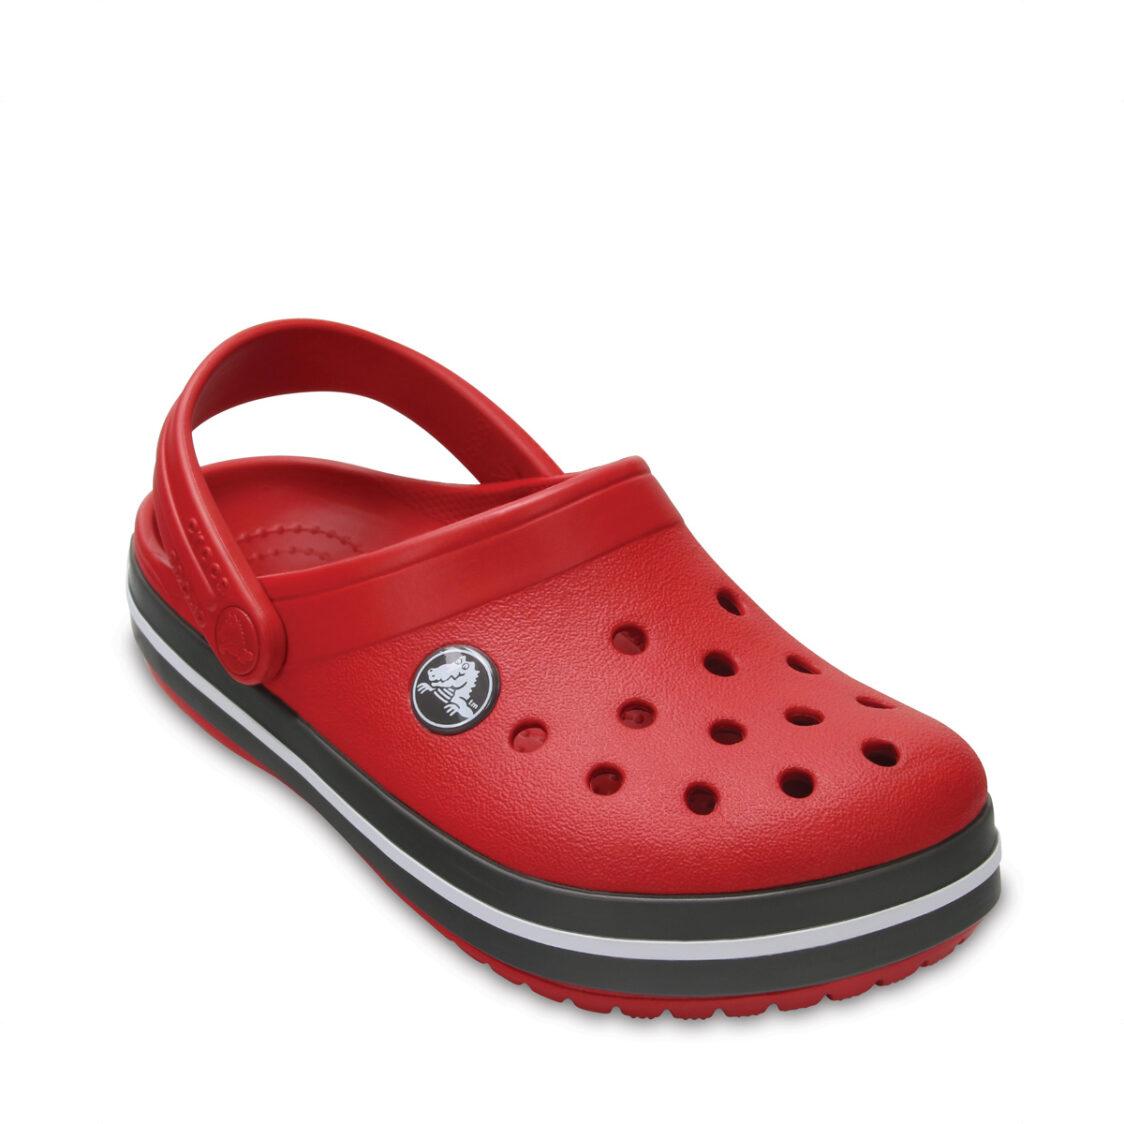 Crocs Crocband Clog K 204537-6IB PepperGraphite